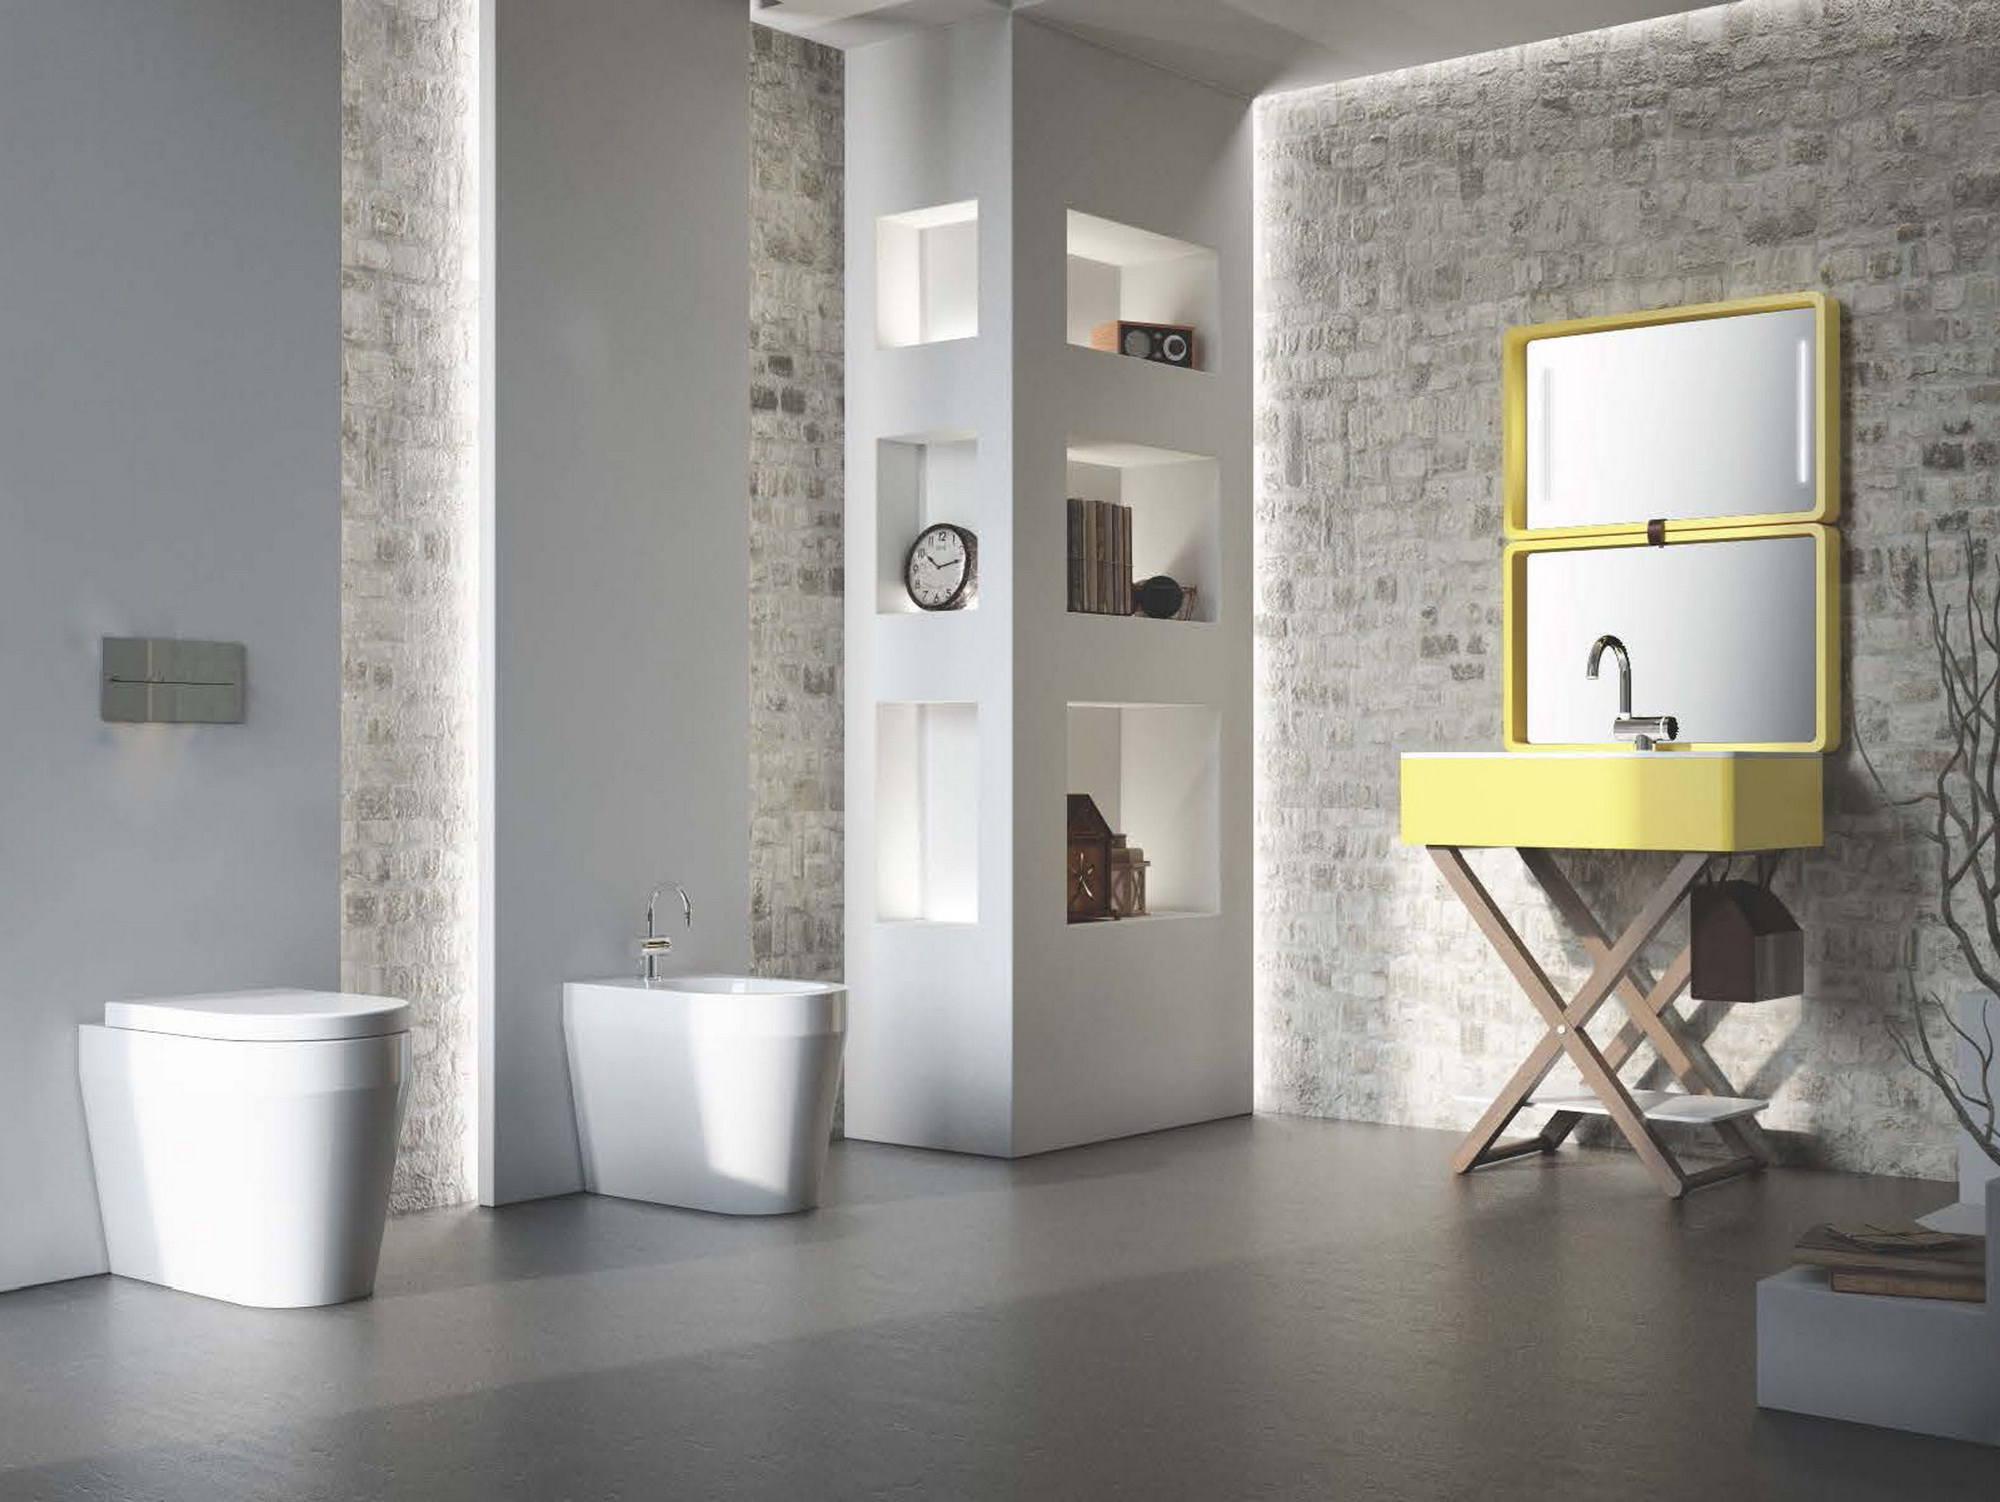 waschbecken mit handtuchhalter my bag by olympia ceramica design gianluca paludi. Black Bedroom Furniture Sets. Home Design Ideas